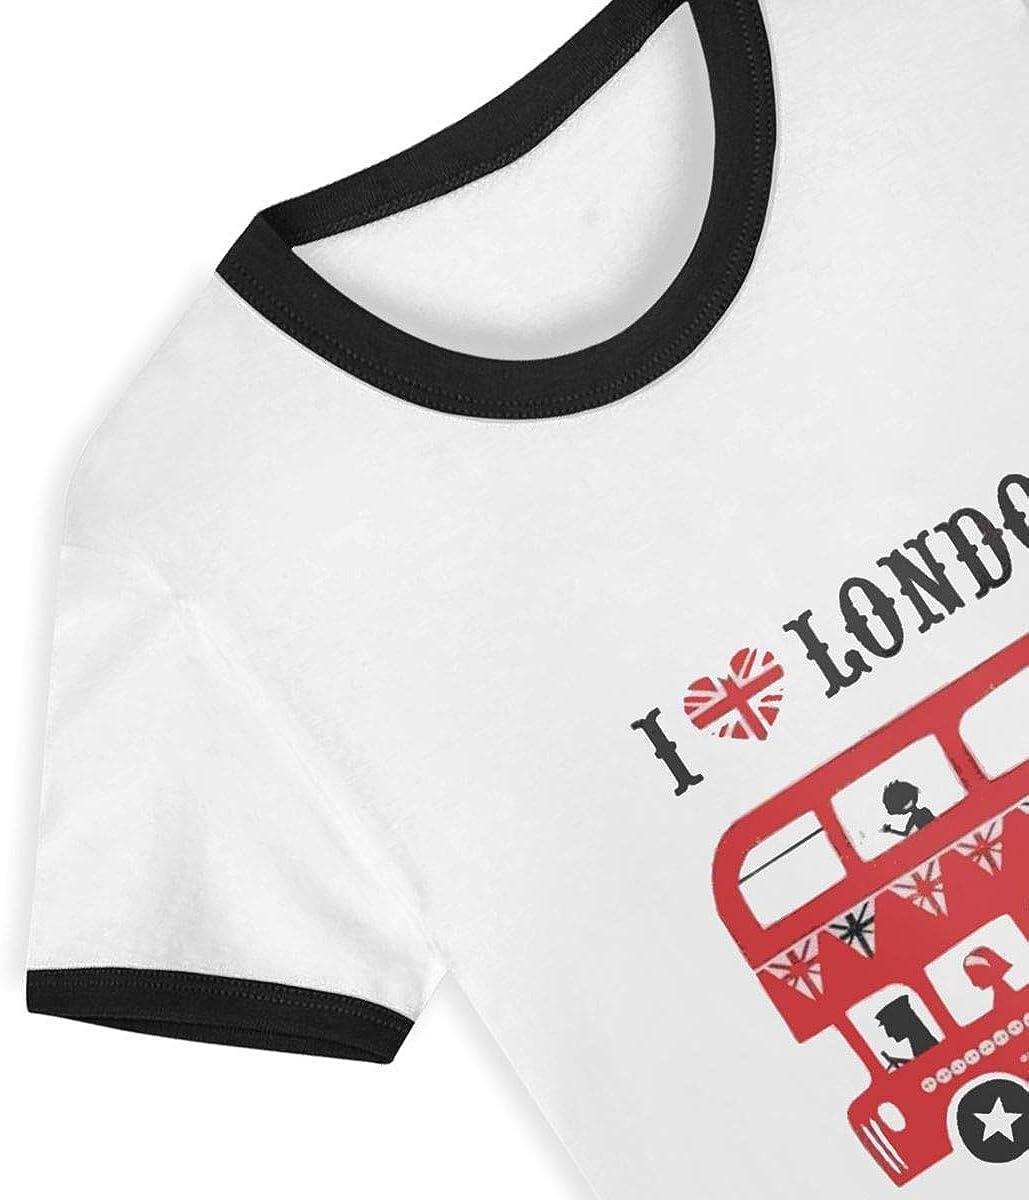 I Love London Tees-Youth Short Sleeve Tee Kids Short T Shirts